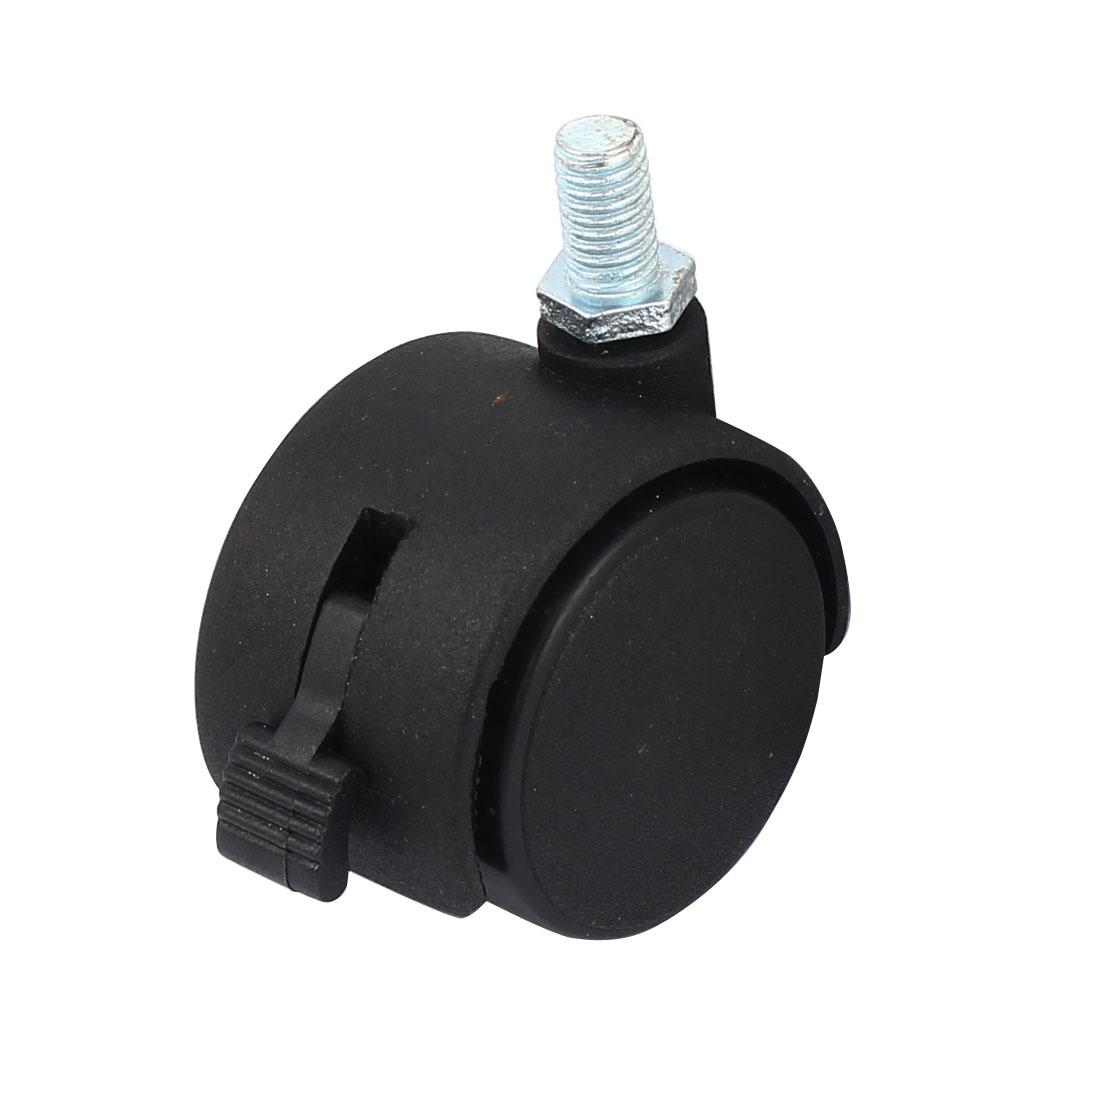 8mm Threaded Stem 1.5 Inch Dia Double Wheel Screw on Type Swivel Locking Brake Caster 4 Pcs